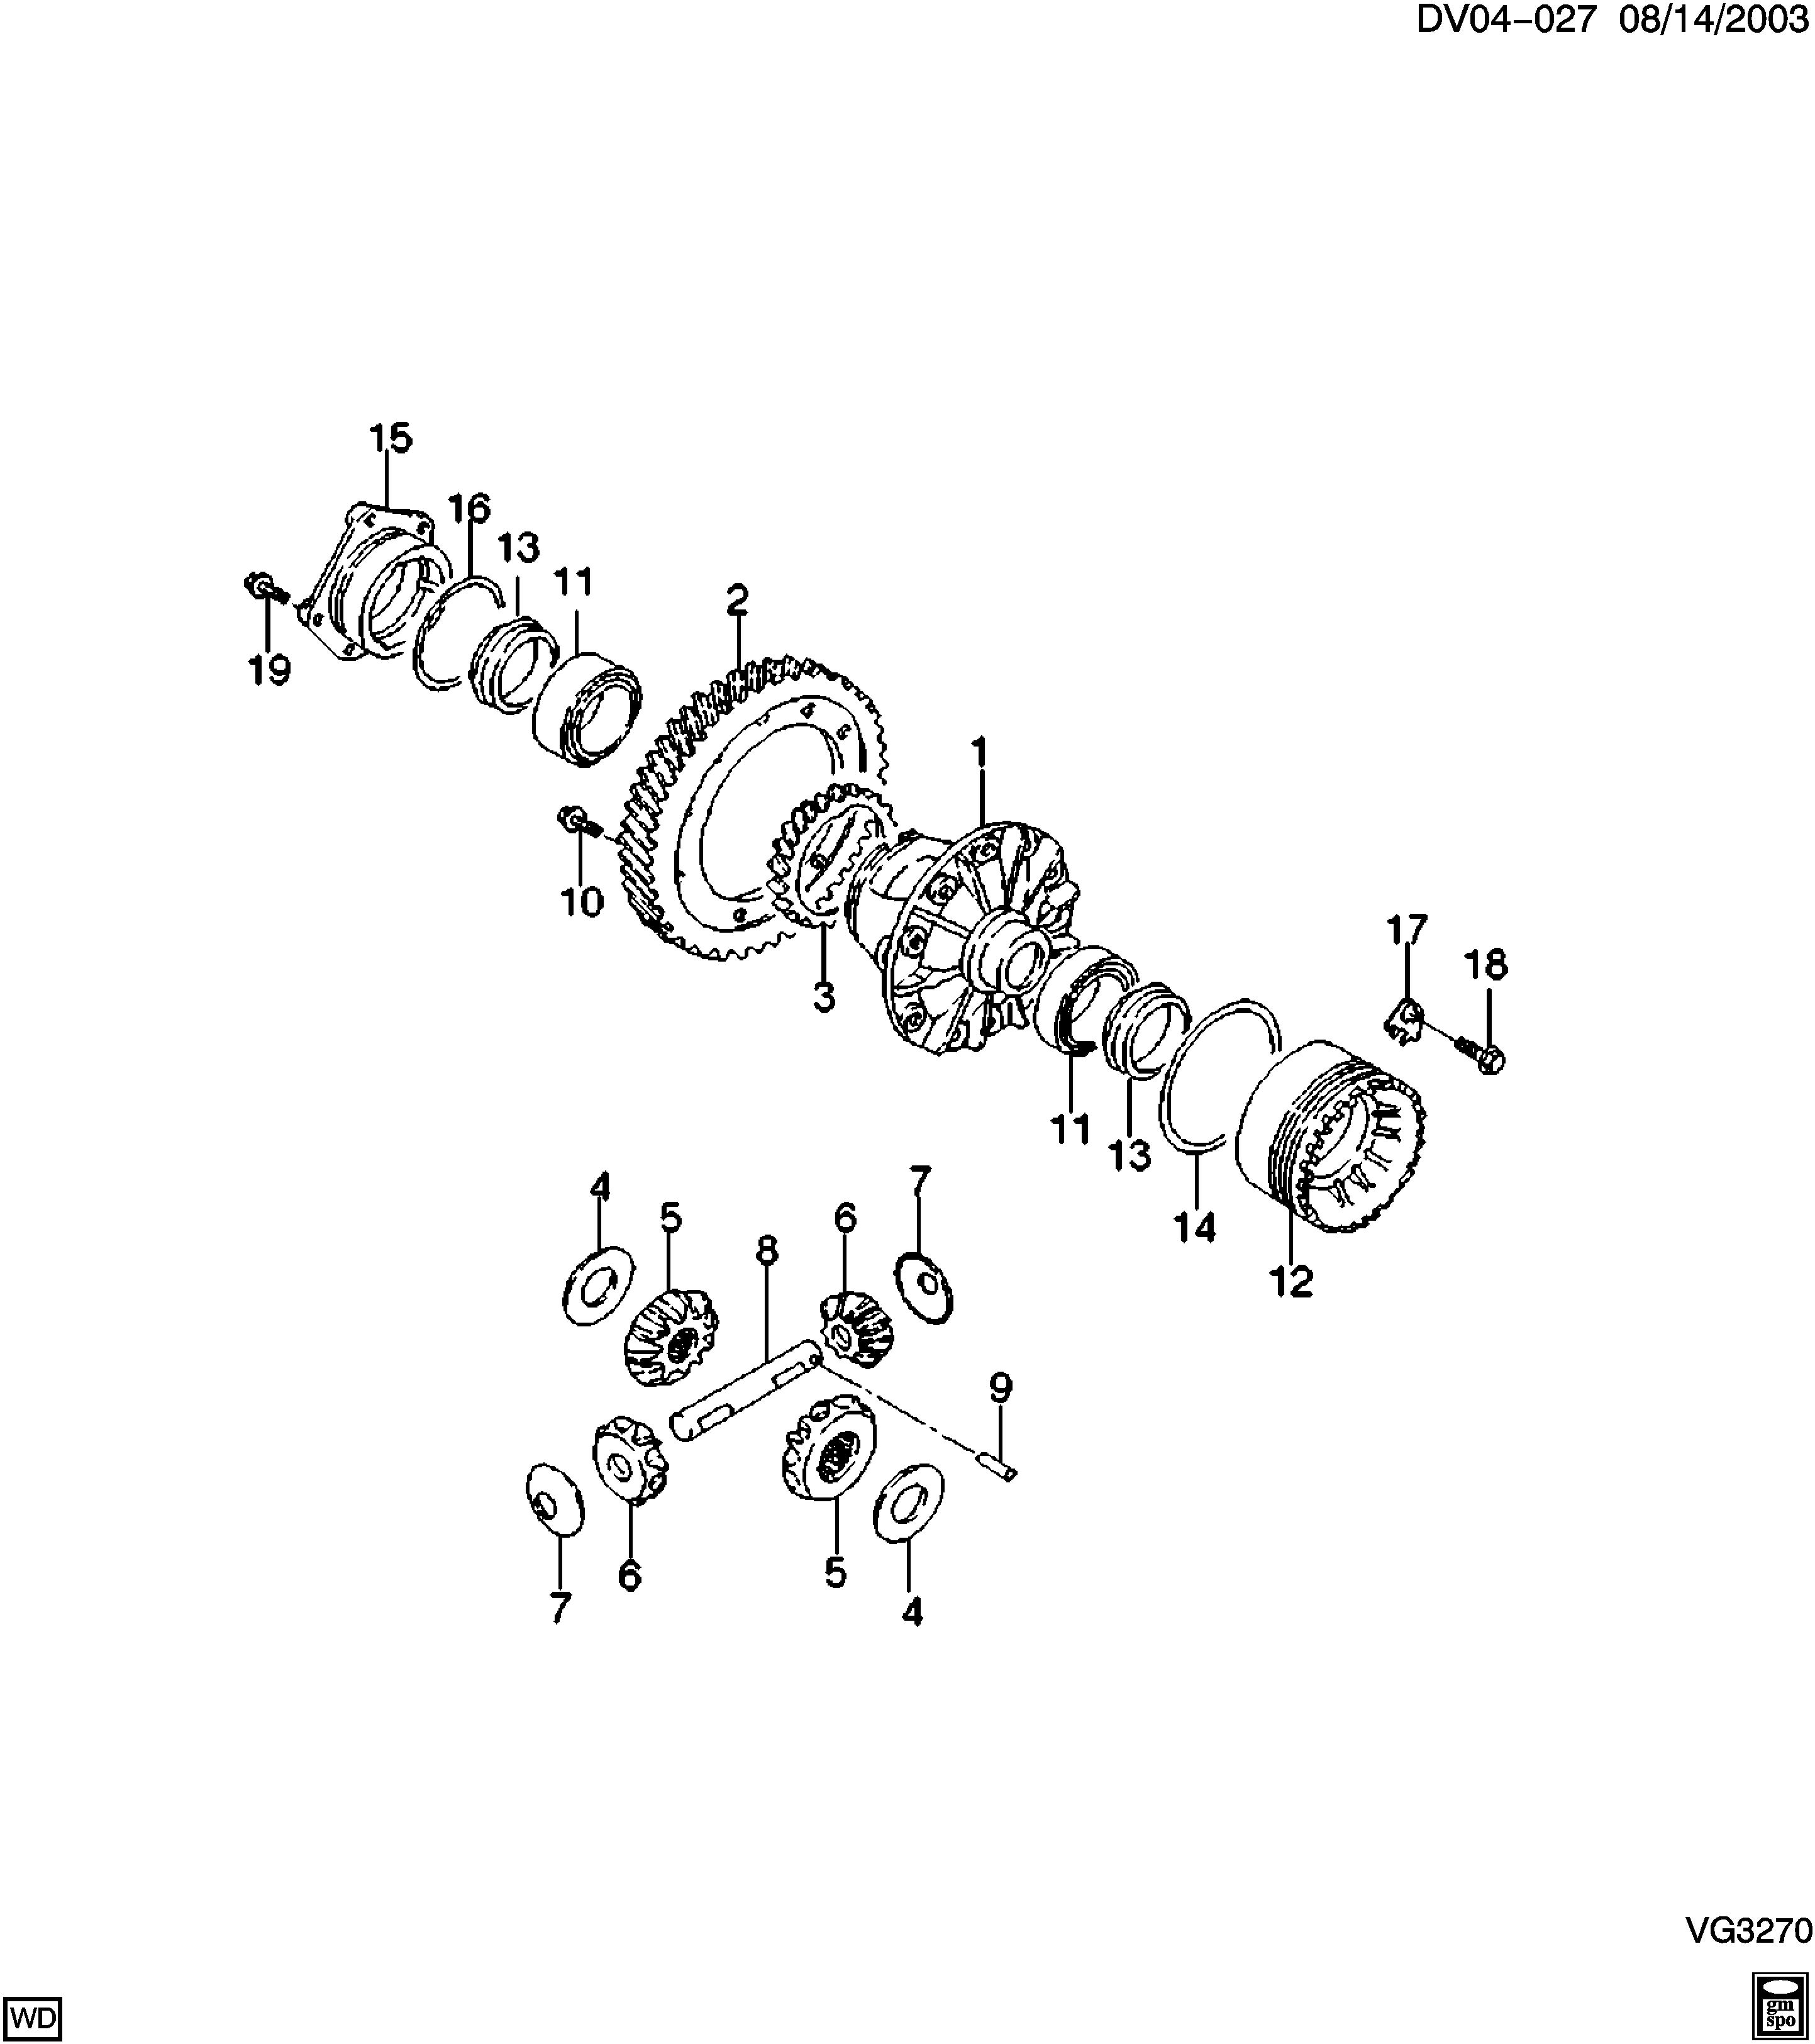 19 Dorado Tuning Adaptateur de Moyeu//Moyeu de Volant d/égagement rapide//Chamade//Nevada R21 DTi 420